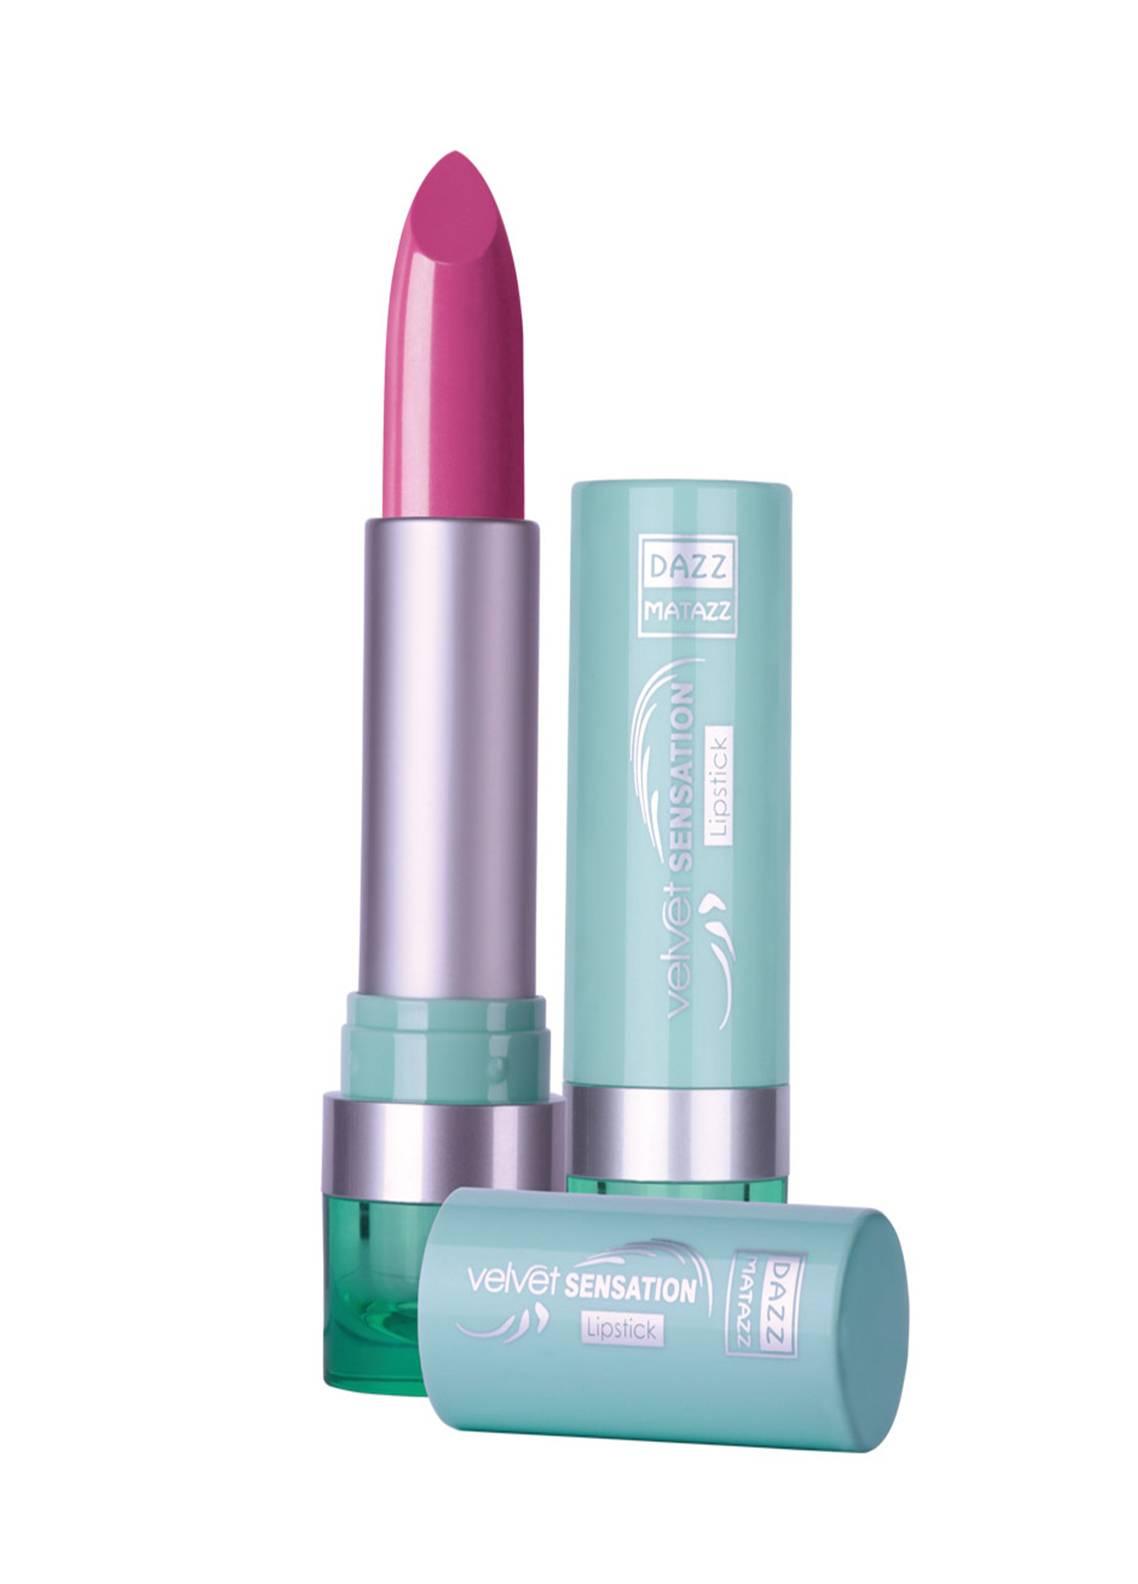 Dazz Matazz Velvet Sensation Lipstick-05 CRUSHED TROPICAL BREEZE